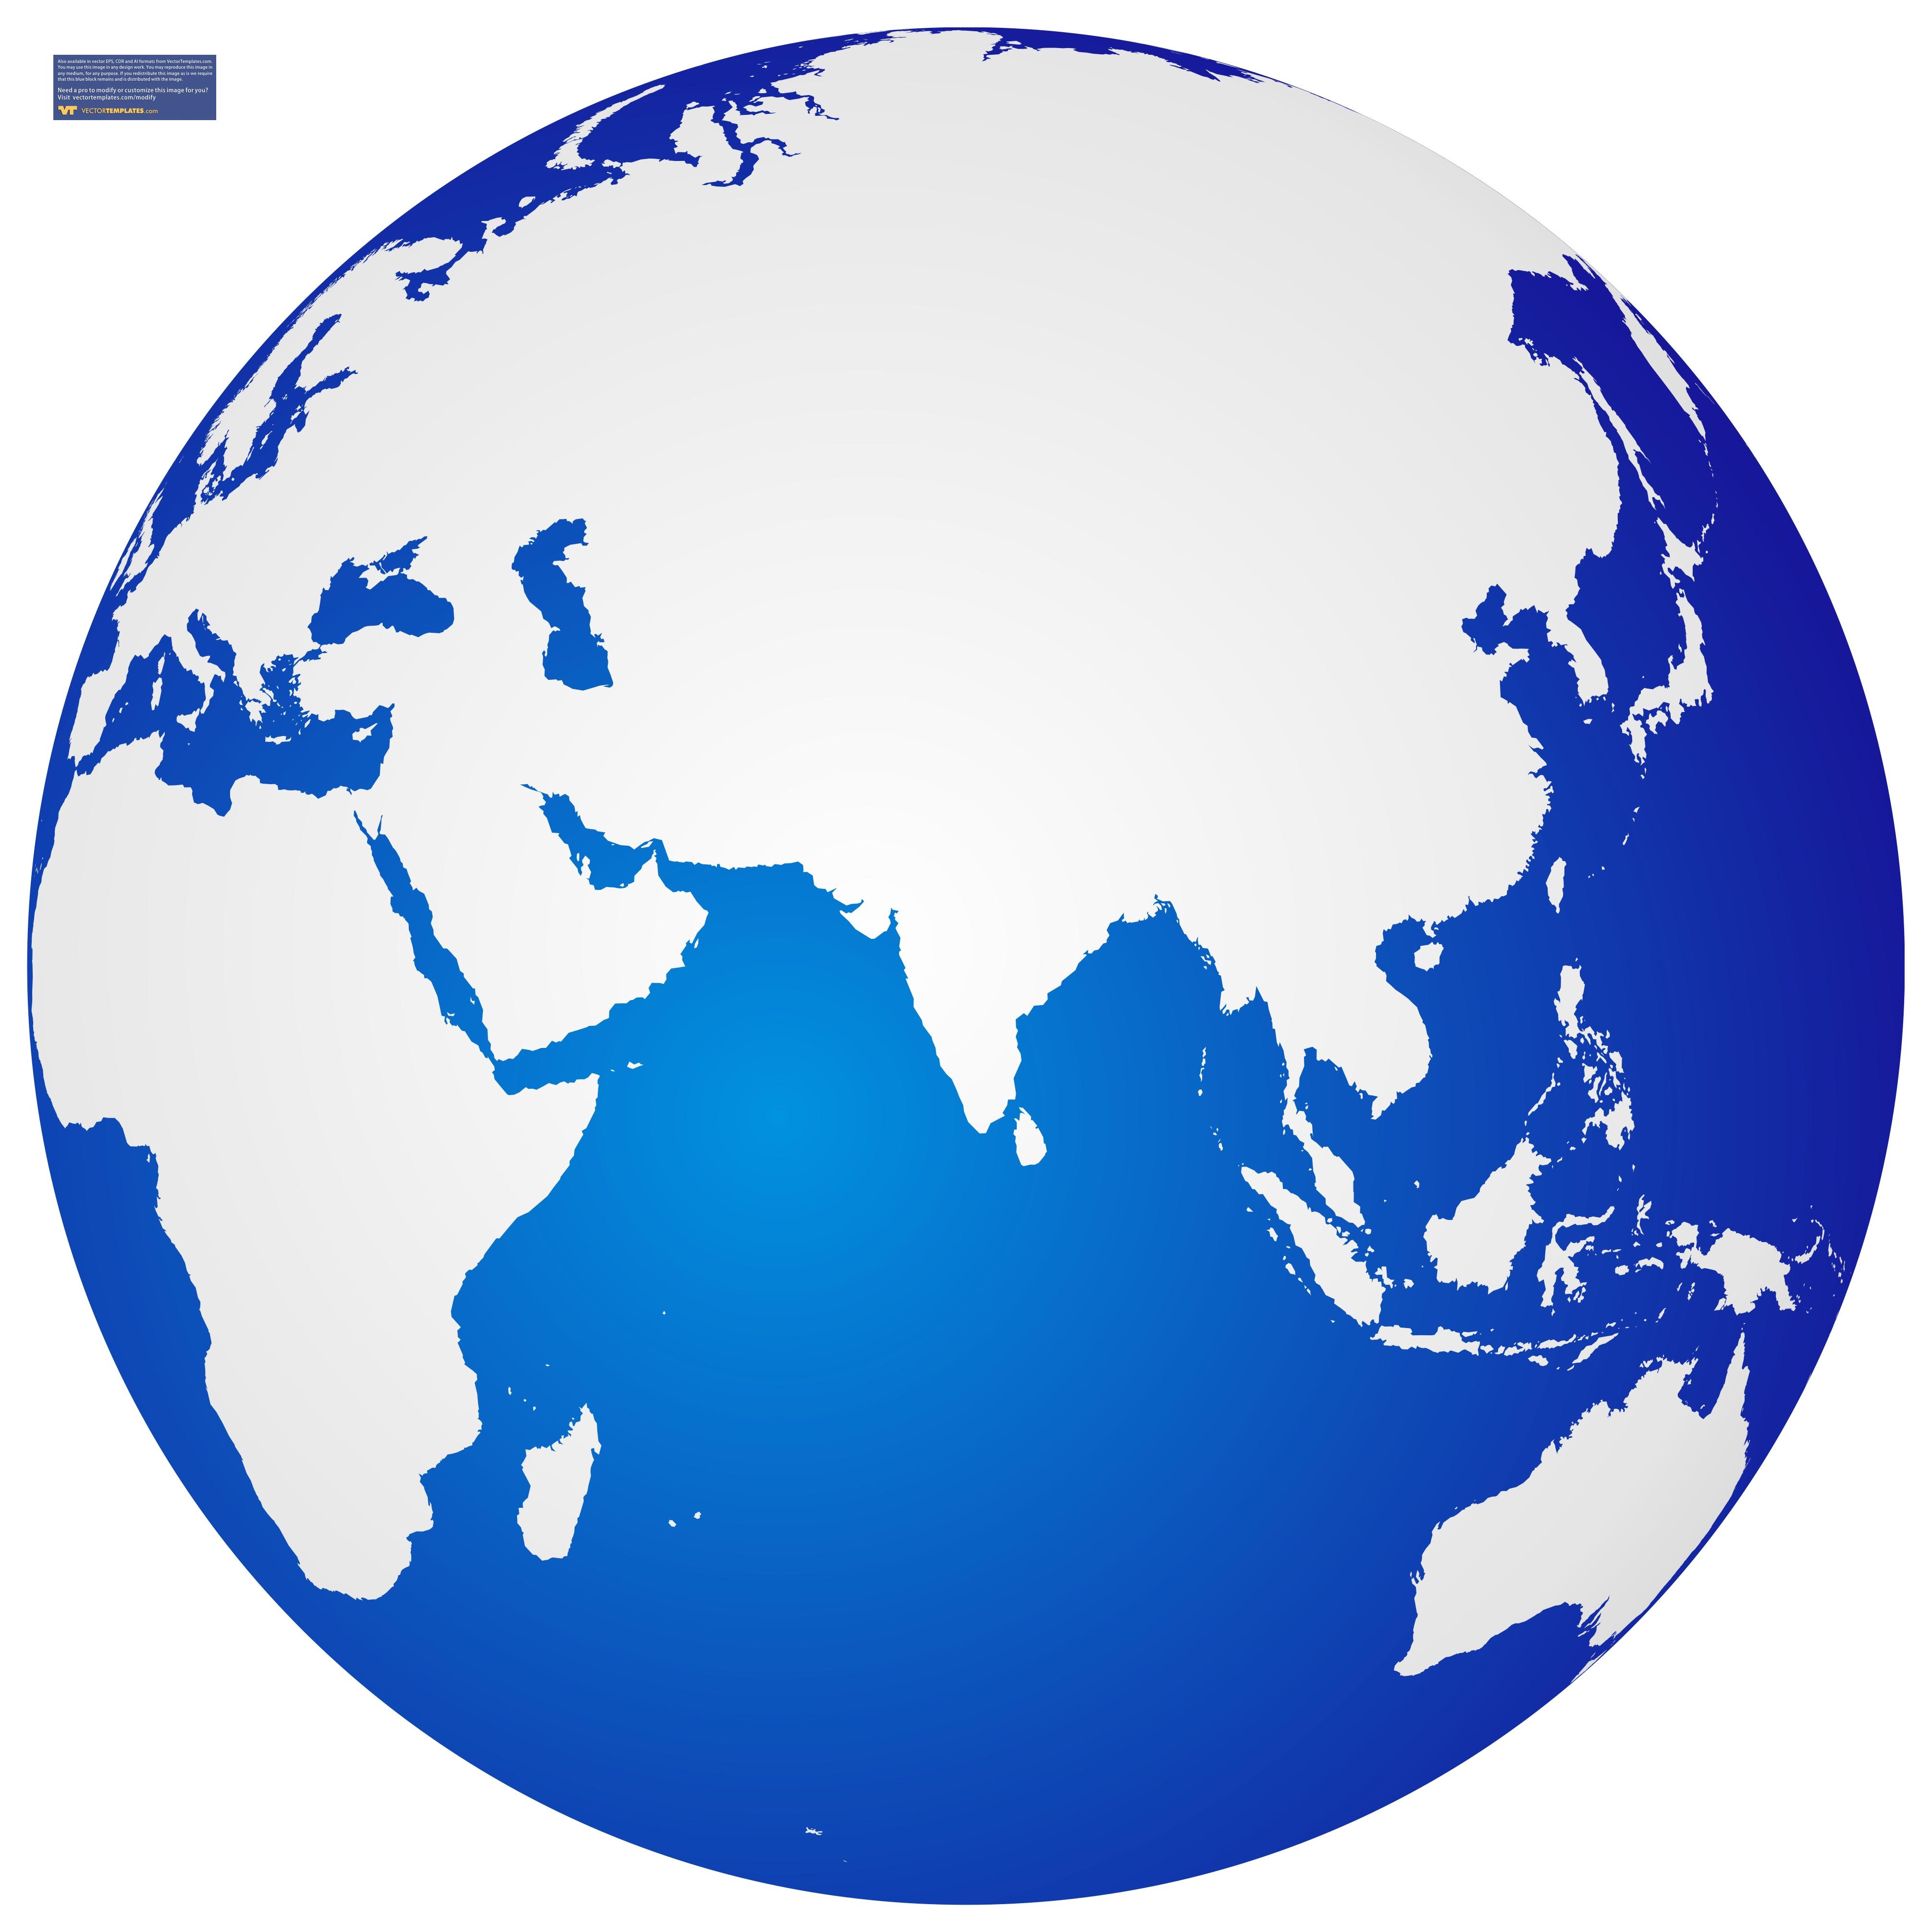 Globe asia clipart.